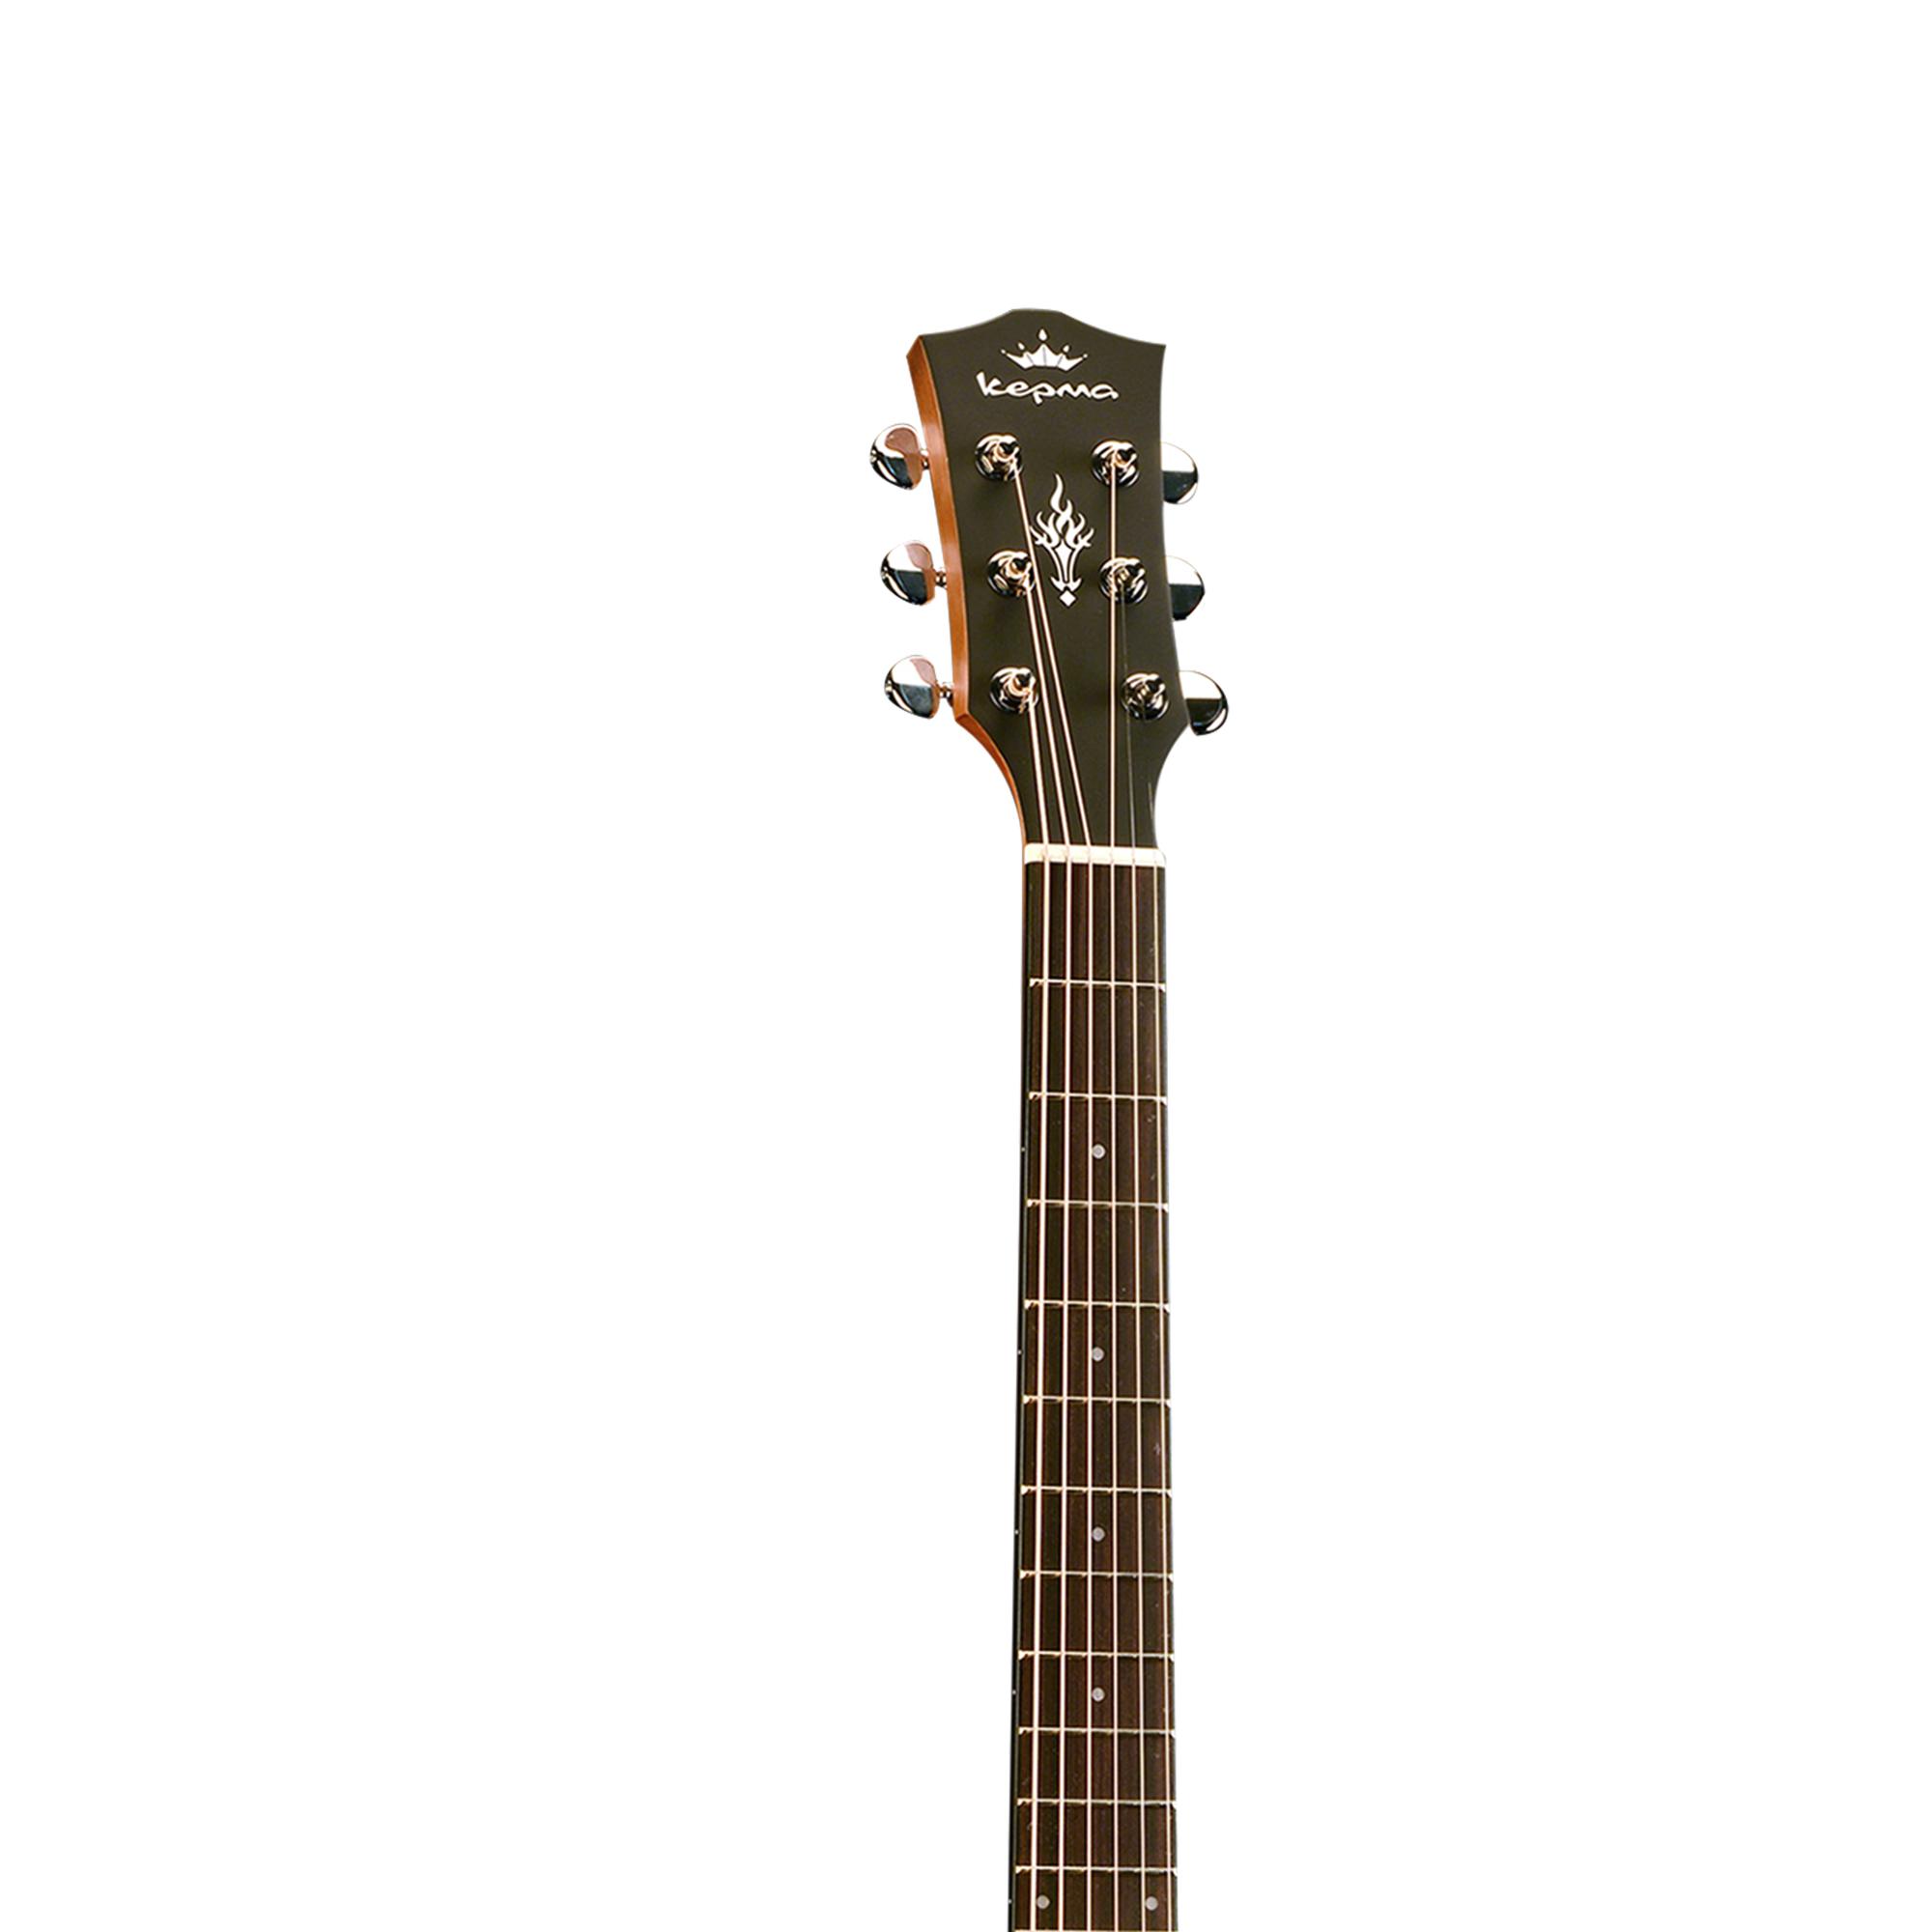 Kepma EAC Acoustic Guitar - Sunburst Matt